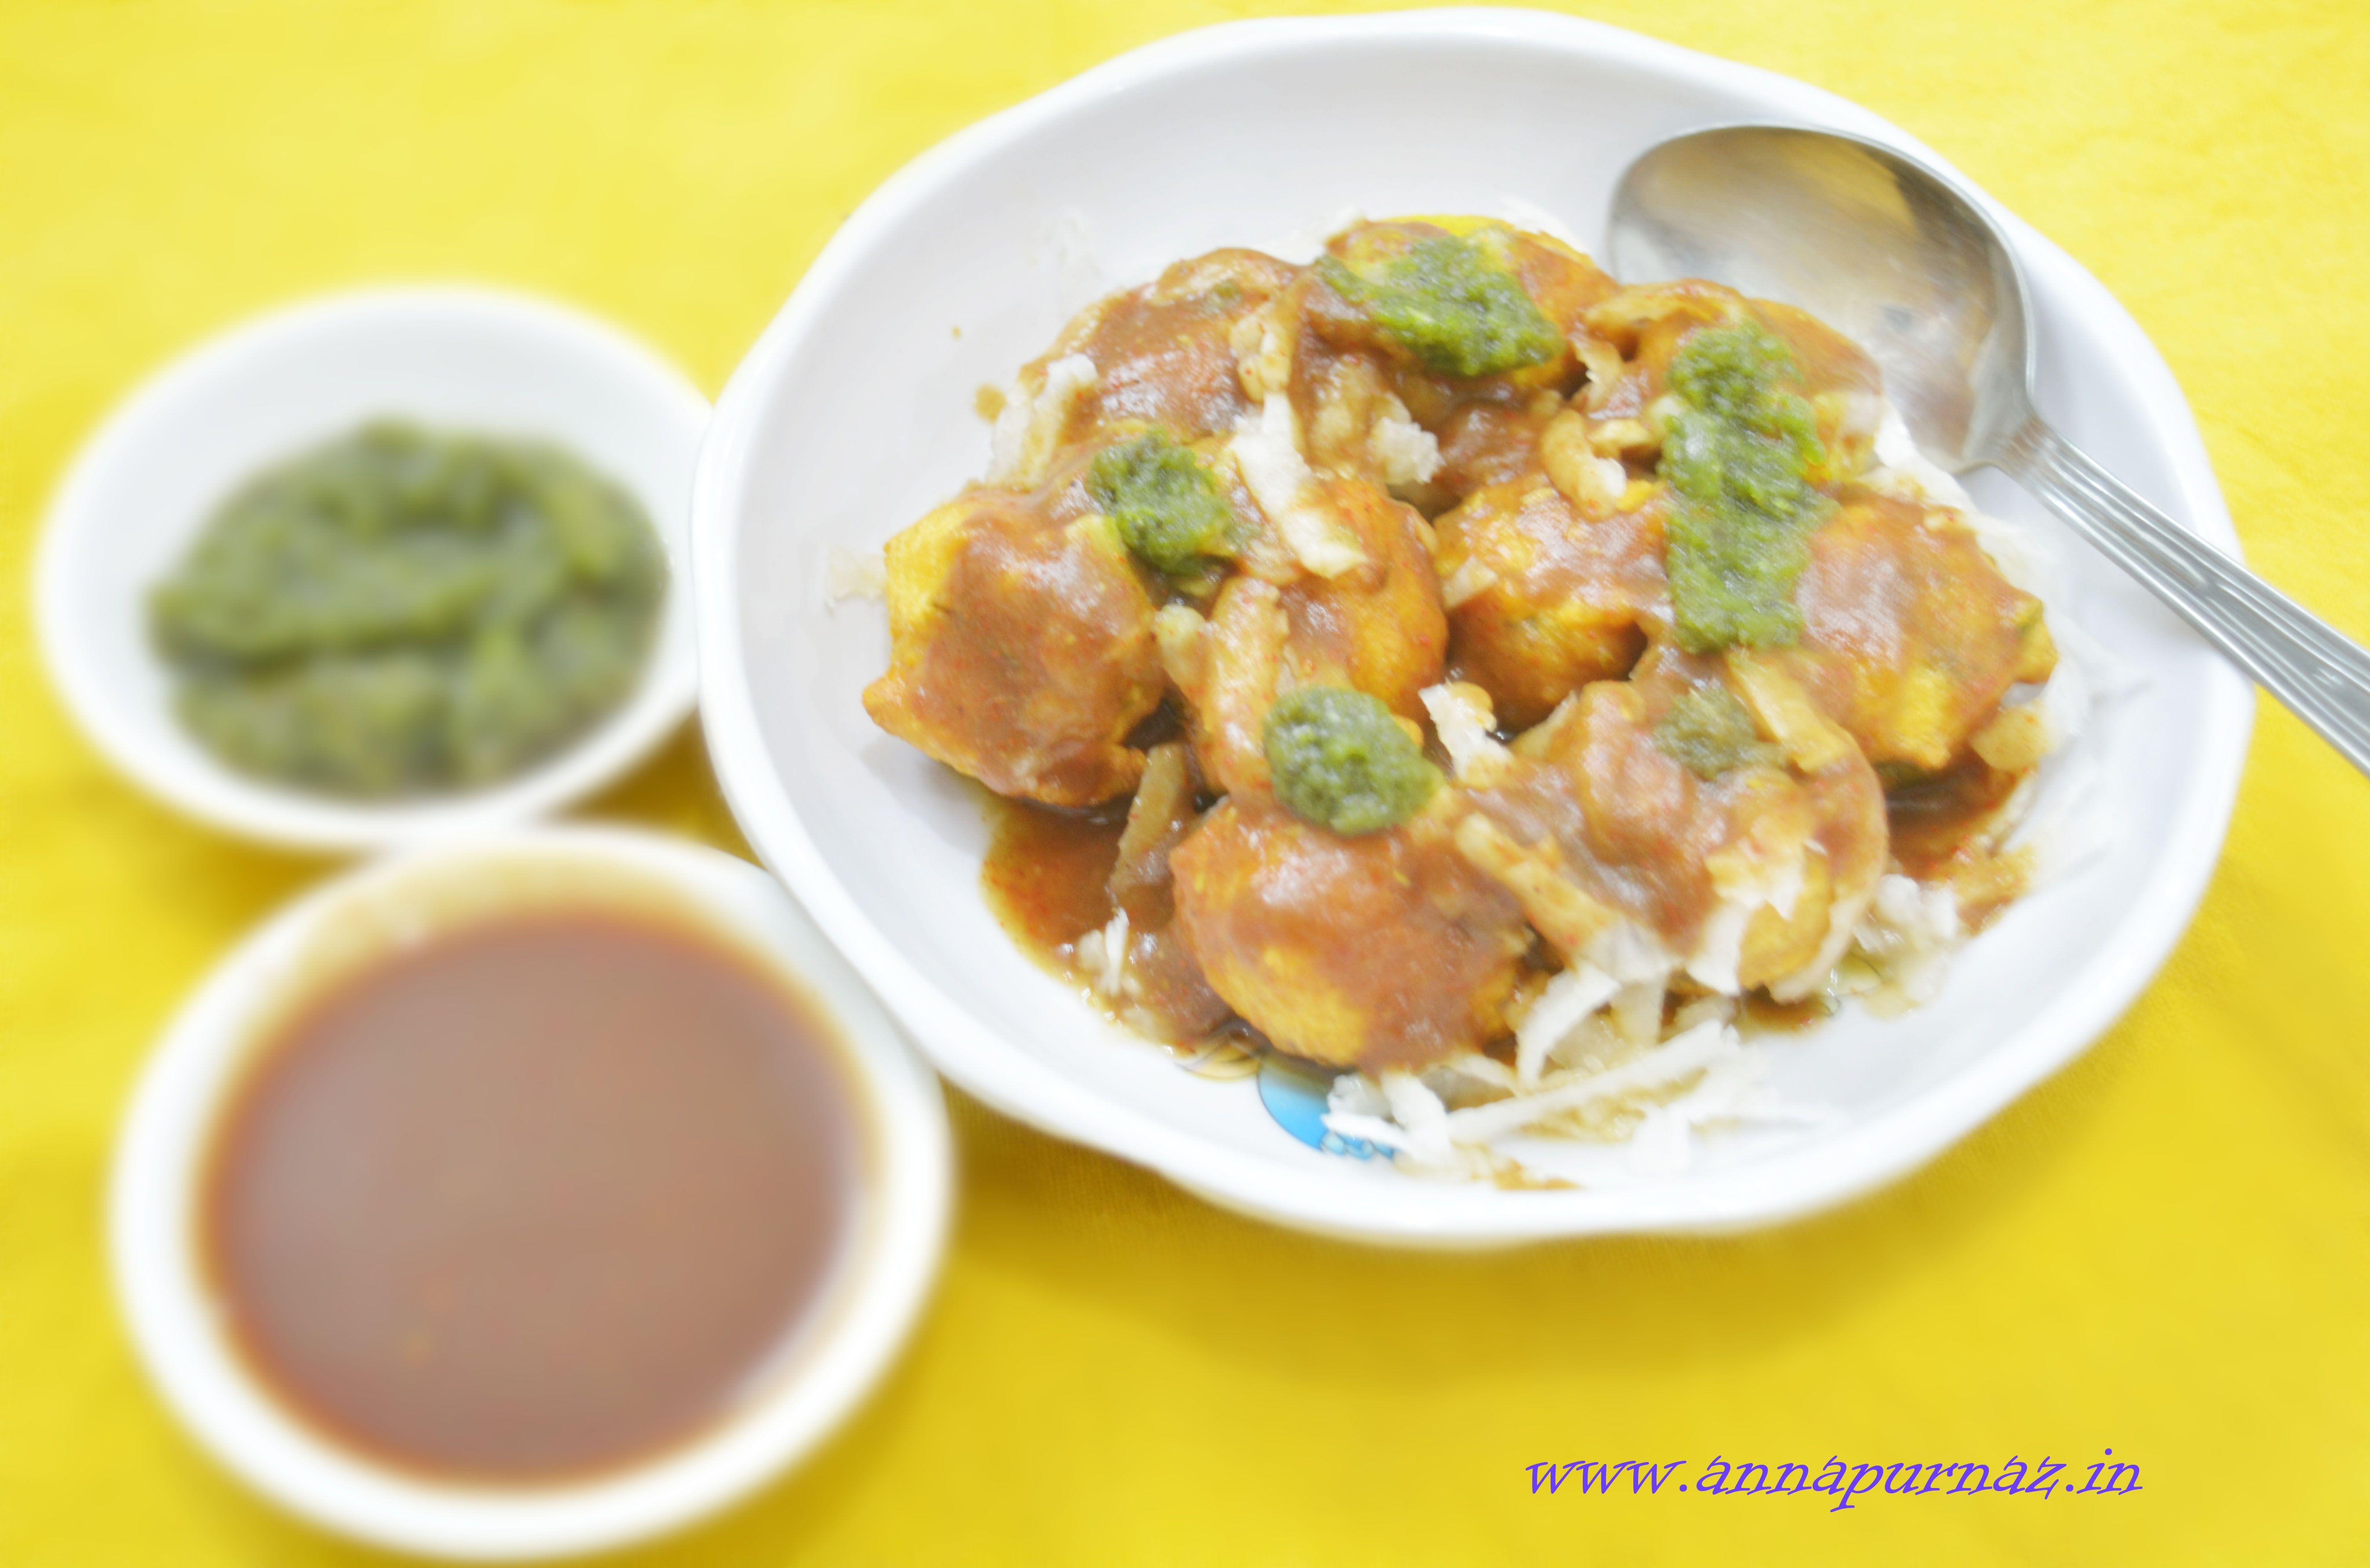 Chatpate Ram Ladoo/ Delhi's Famous Ram Ladoo #streetfood #spicyandtangy #delectable #easyrecipe #moongdalfritters #moongdalpakoras Recipe at :www.annapurnaz.in